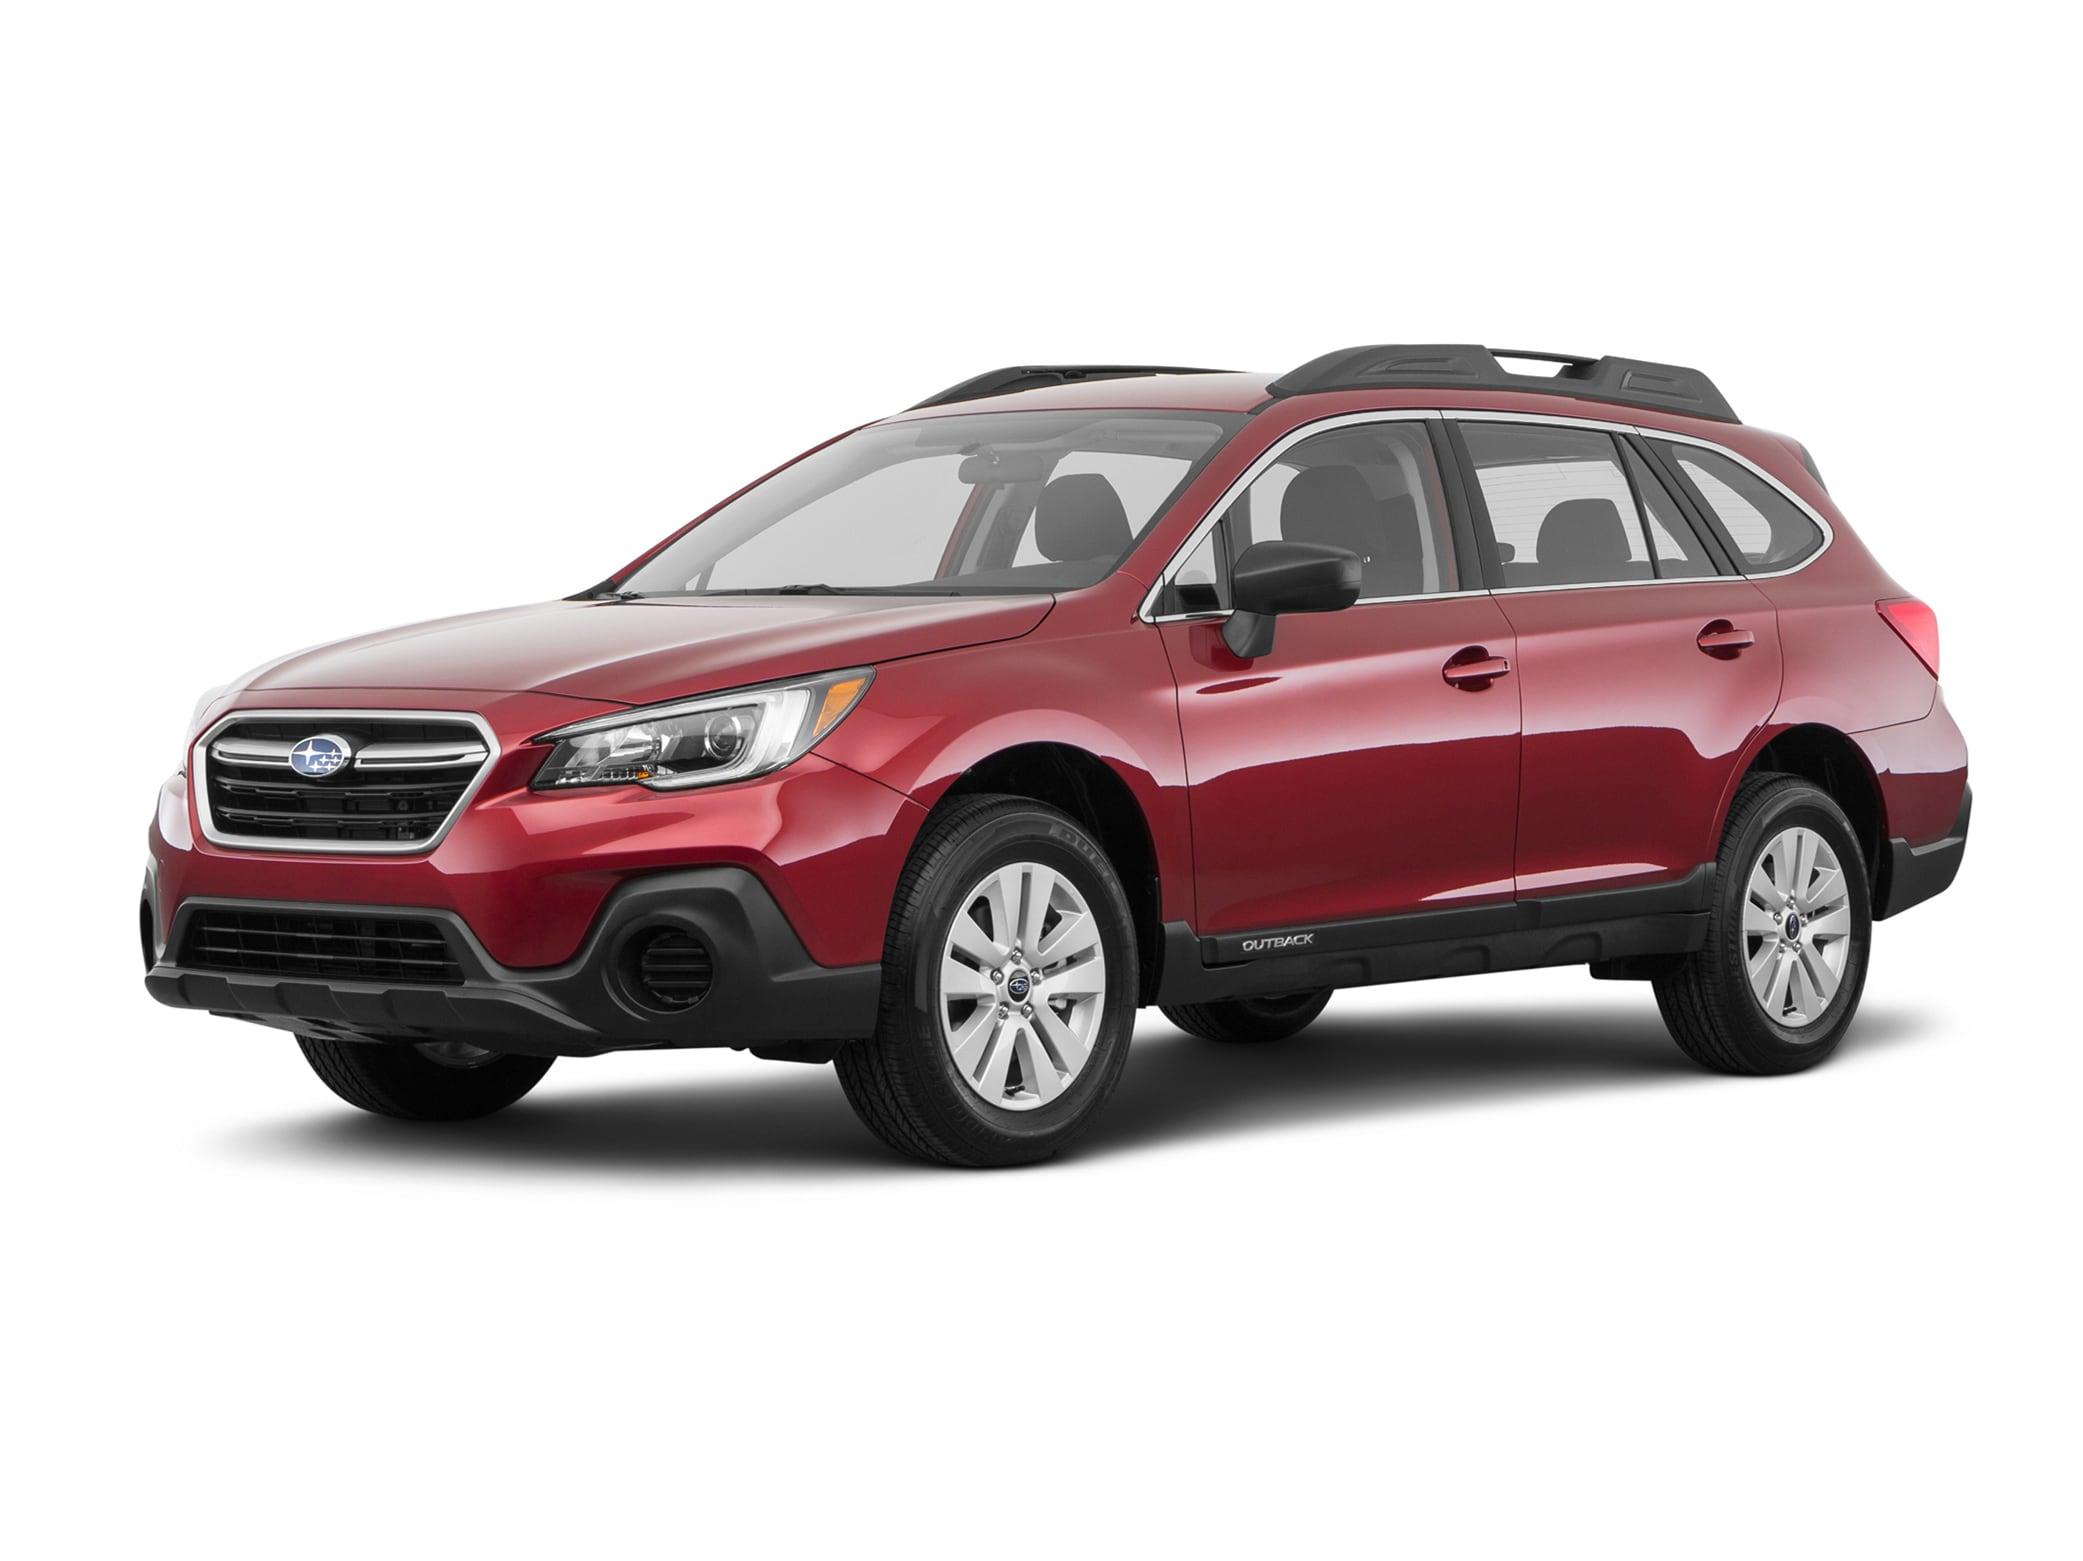 New 2019 Subaru Outback 2.5i SUV for sale in Riverhead, NY